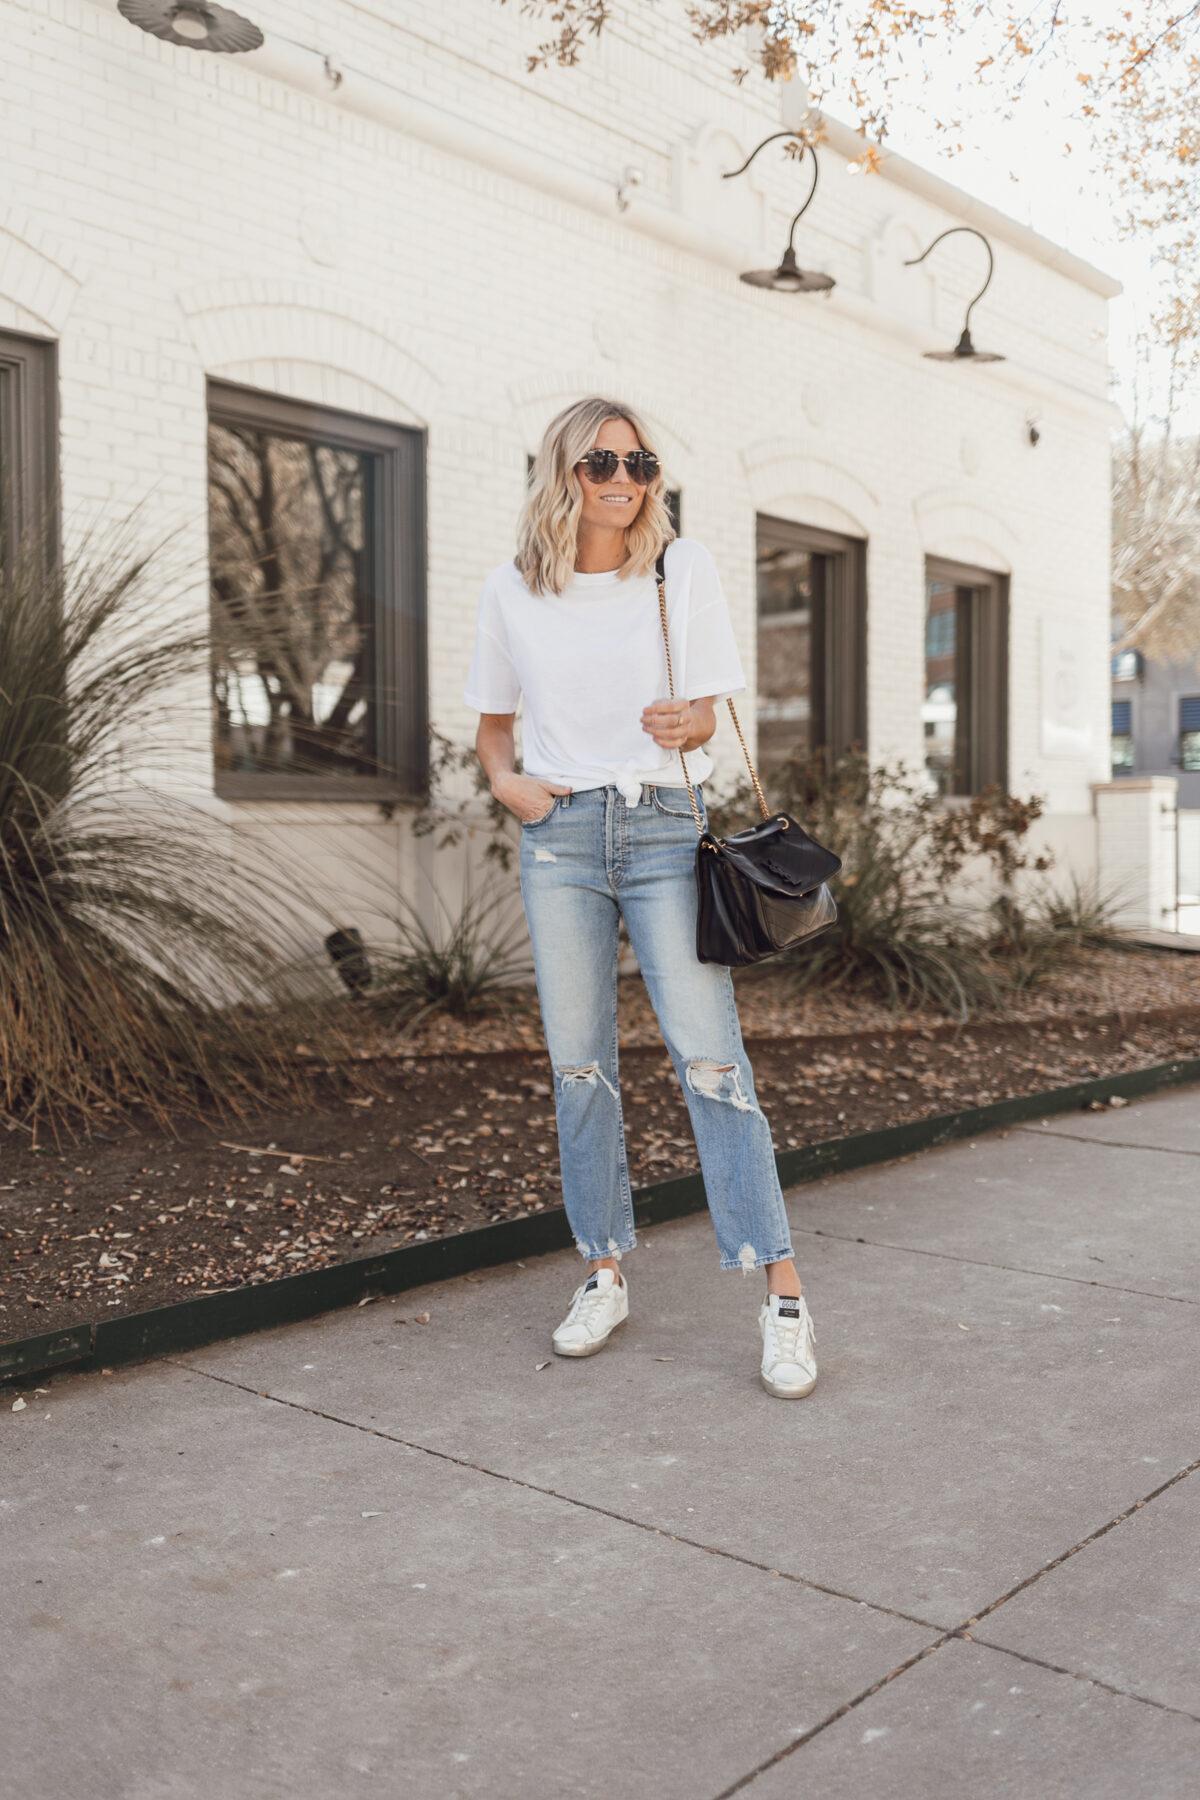 woman wearing white shirt and denim pants